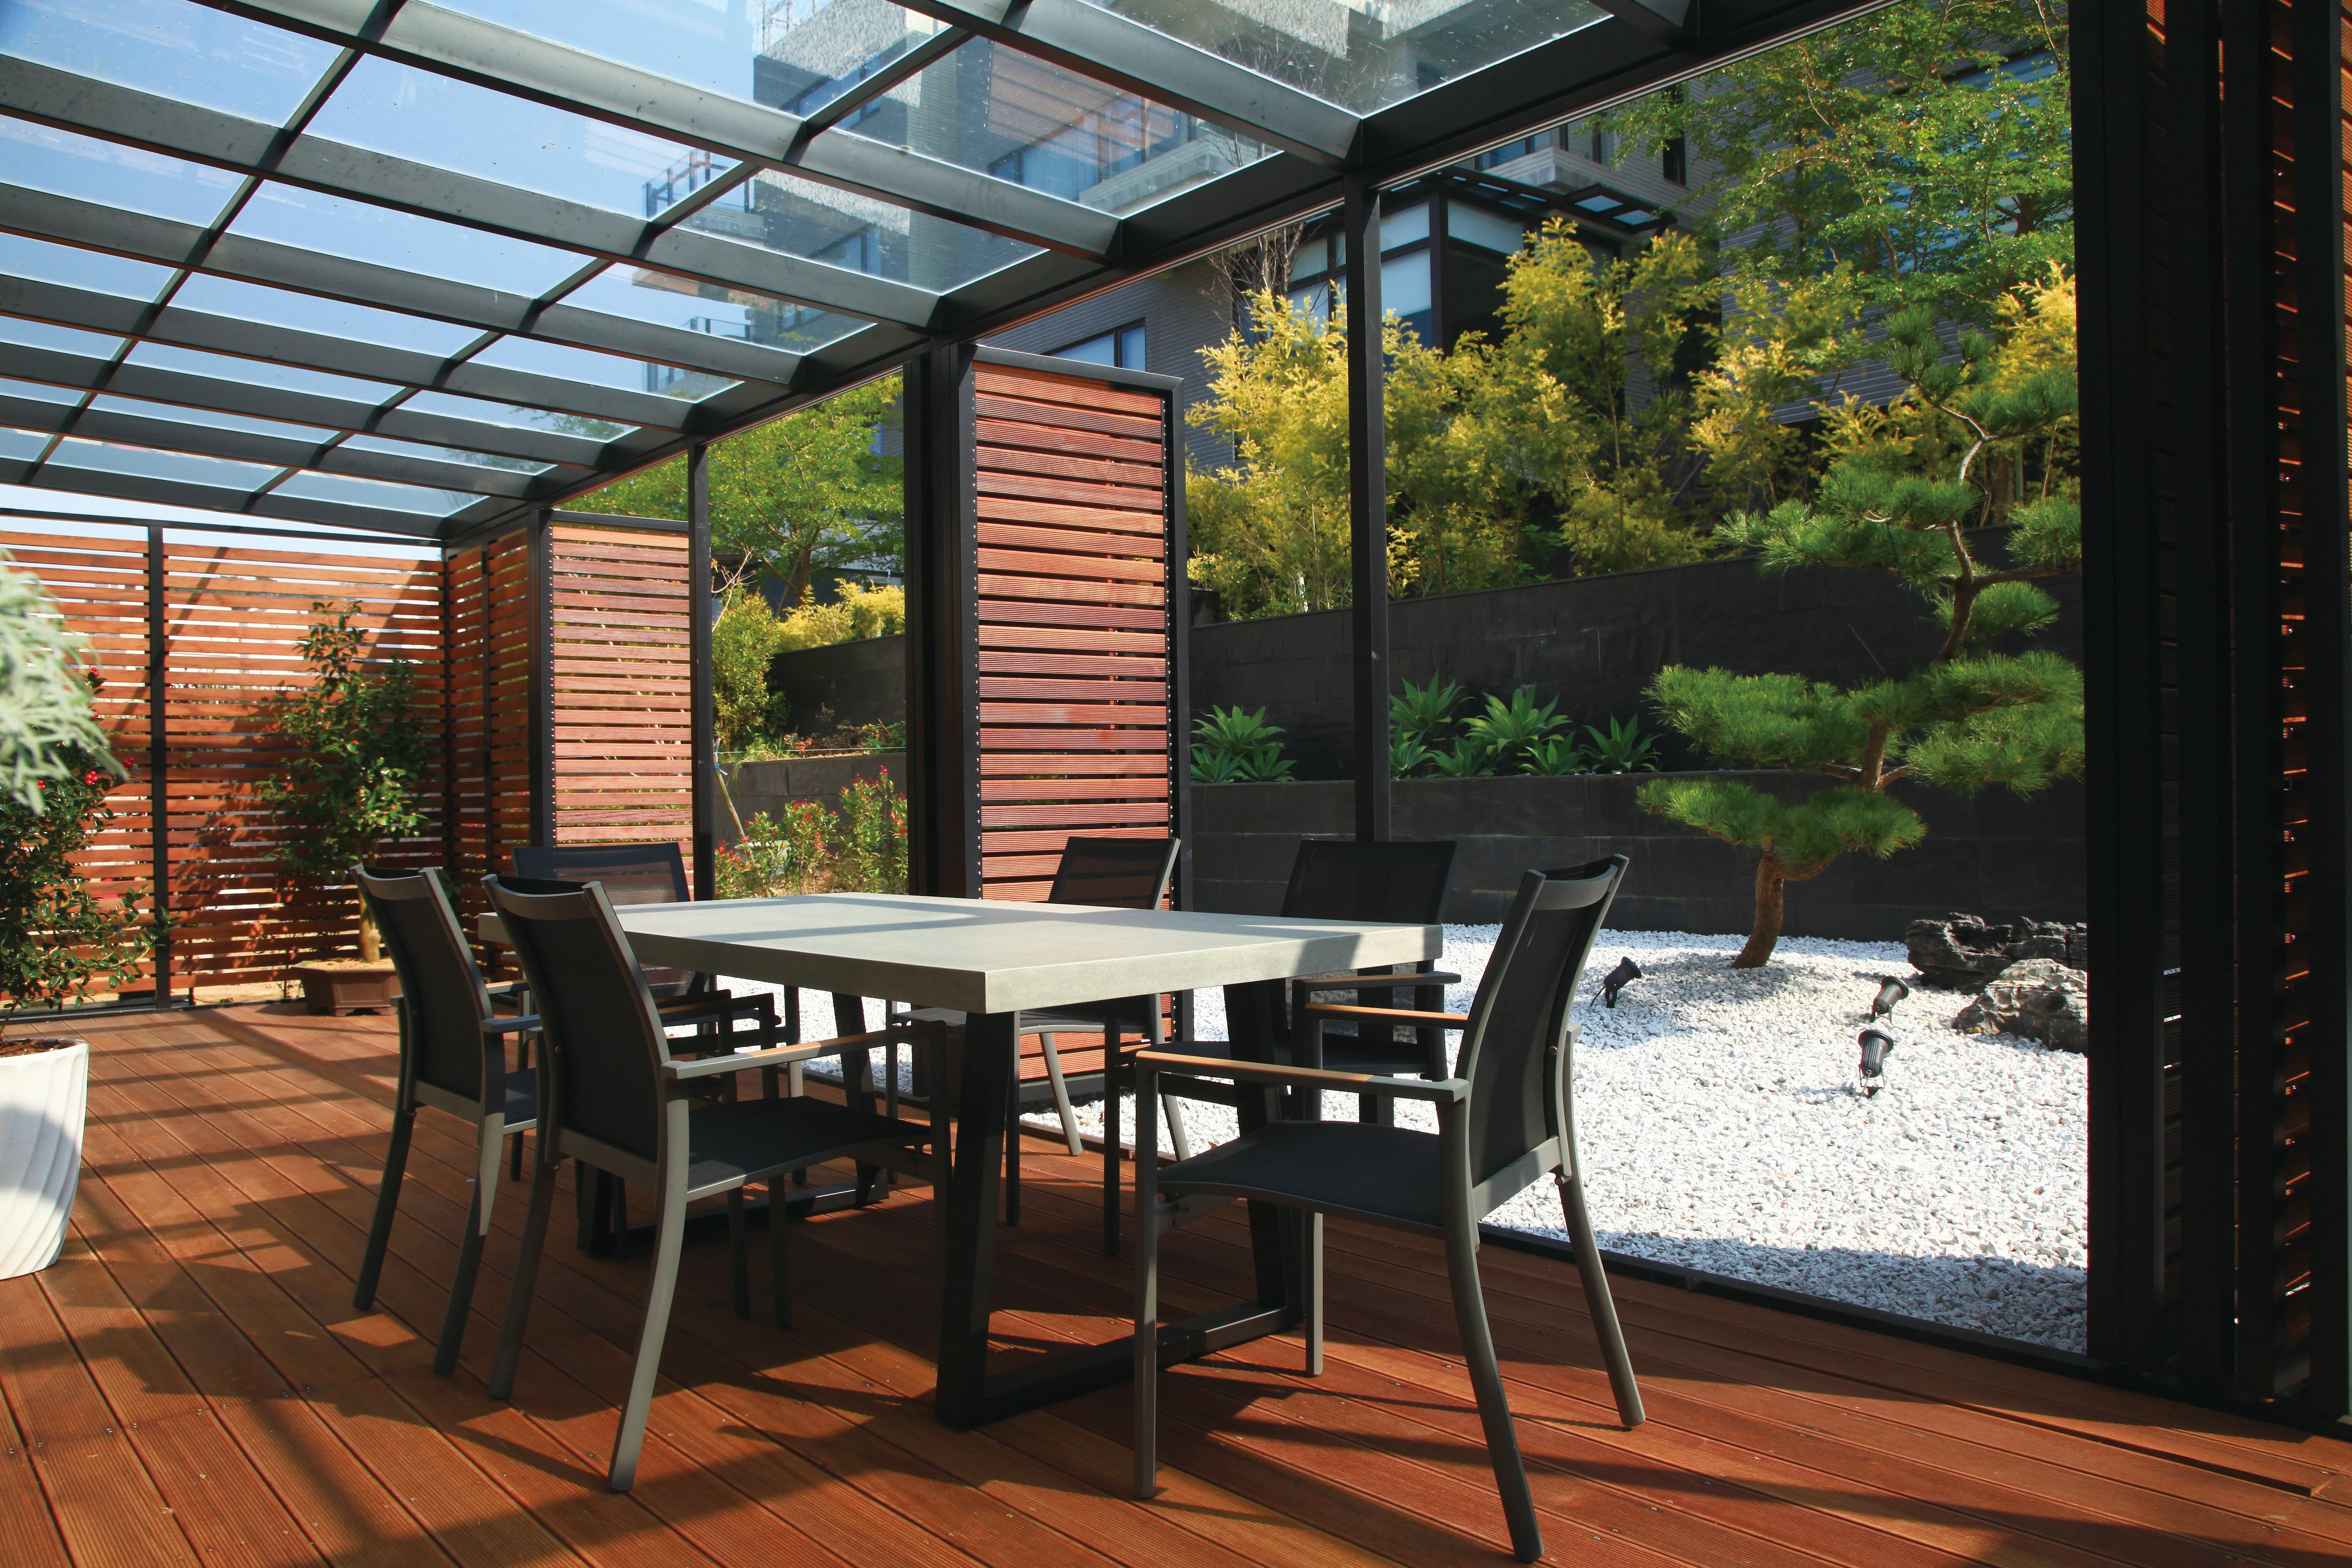 Lavastone系列梯形長桌 / 黑色網布椅